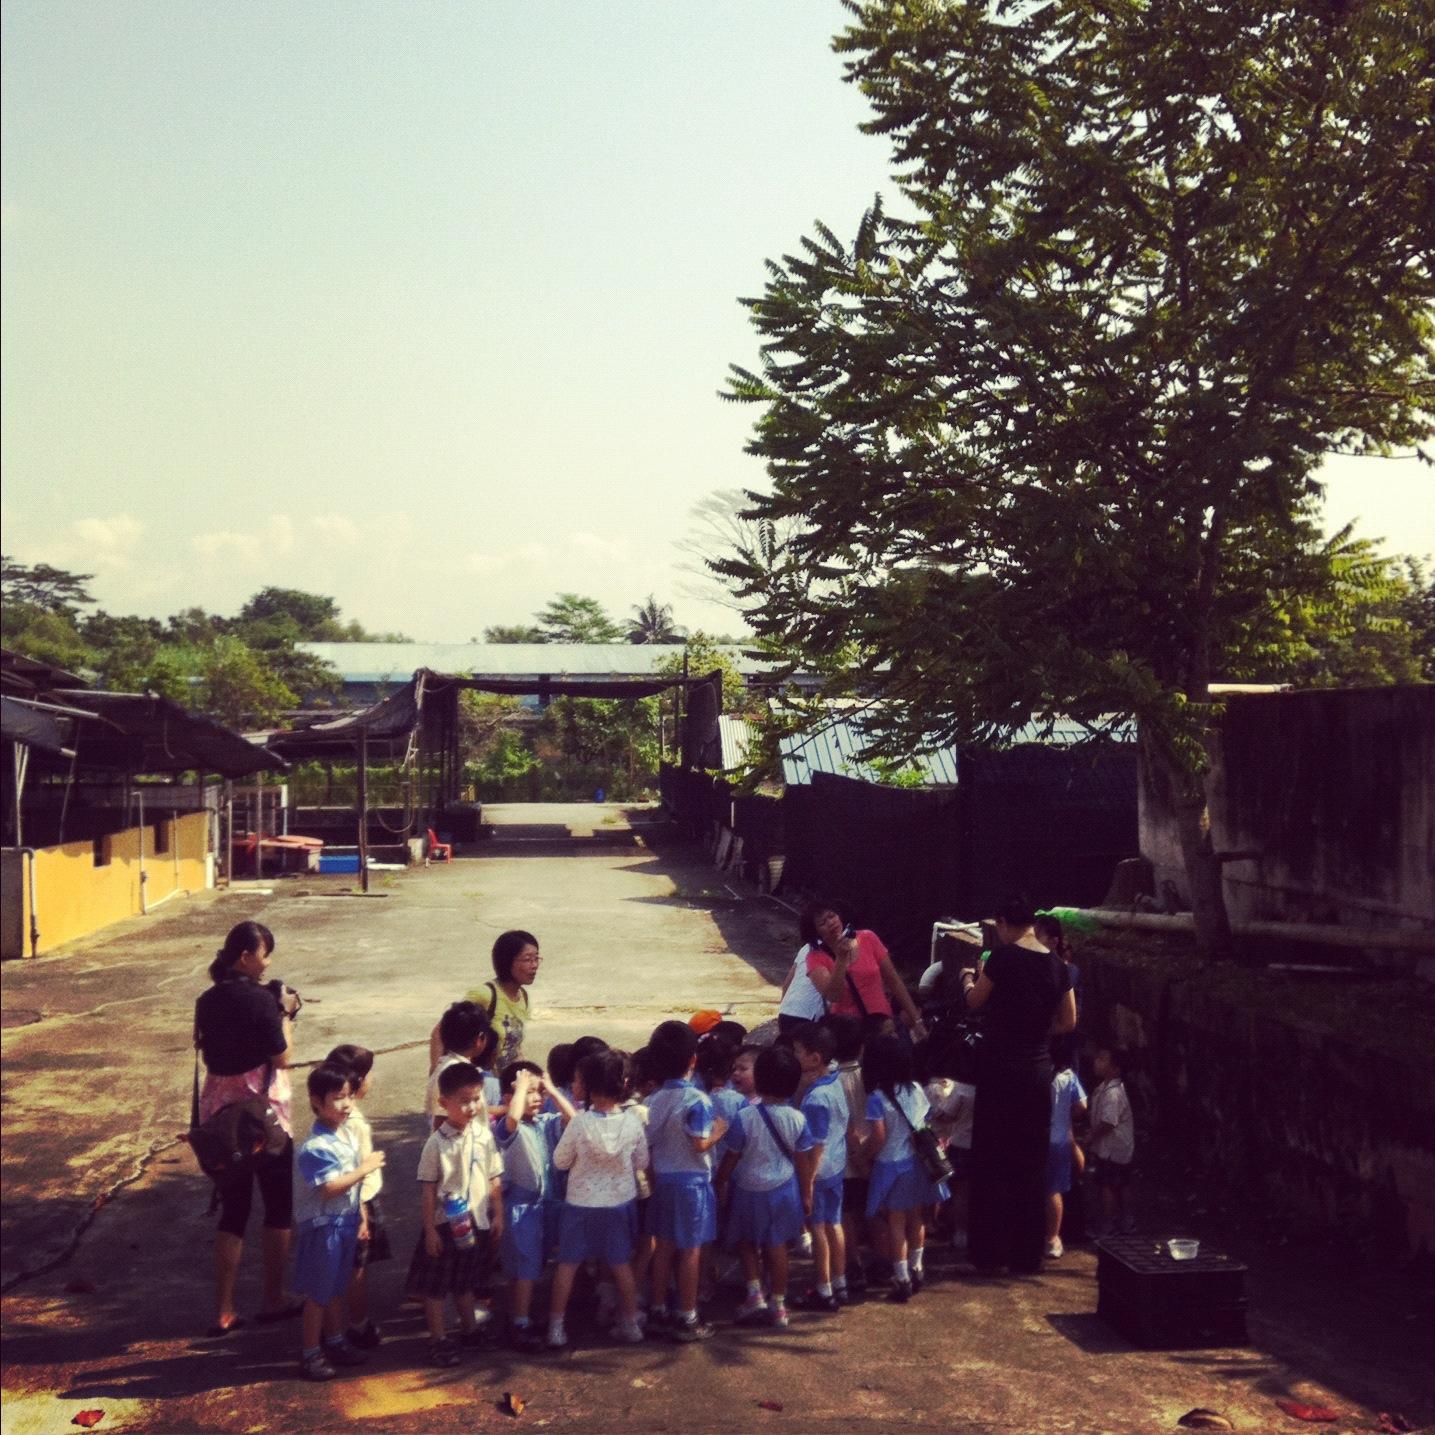 JUST KIDS @ Taman Jurong